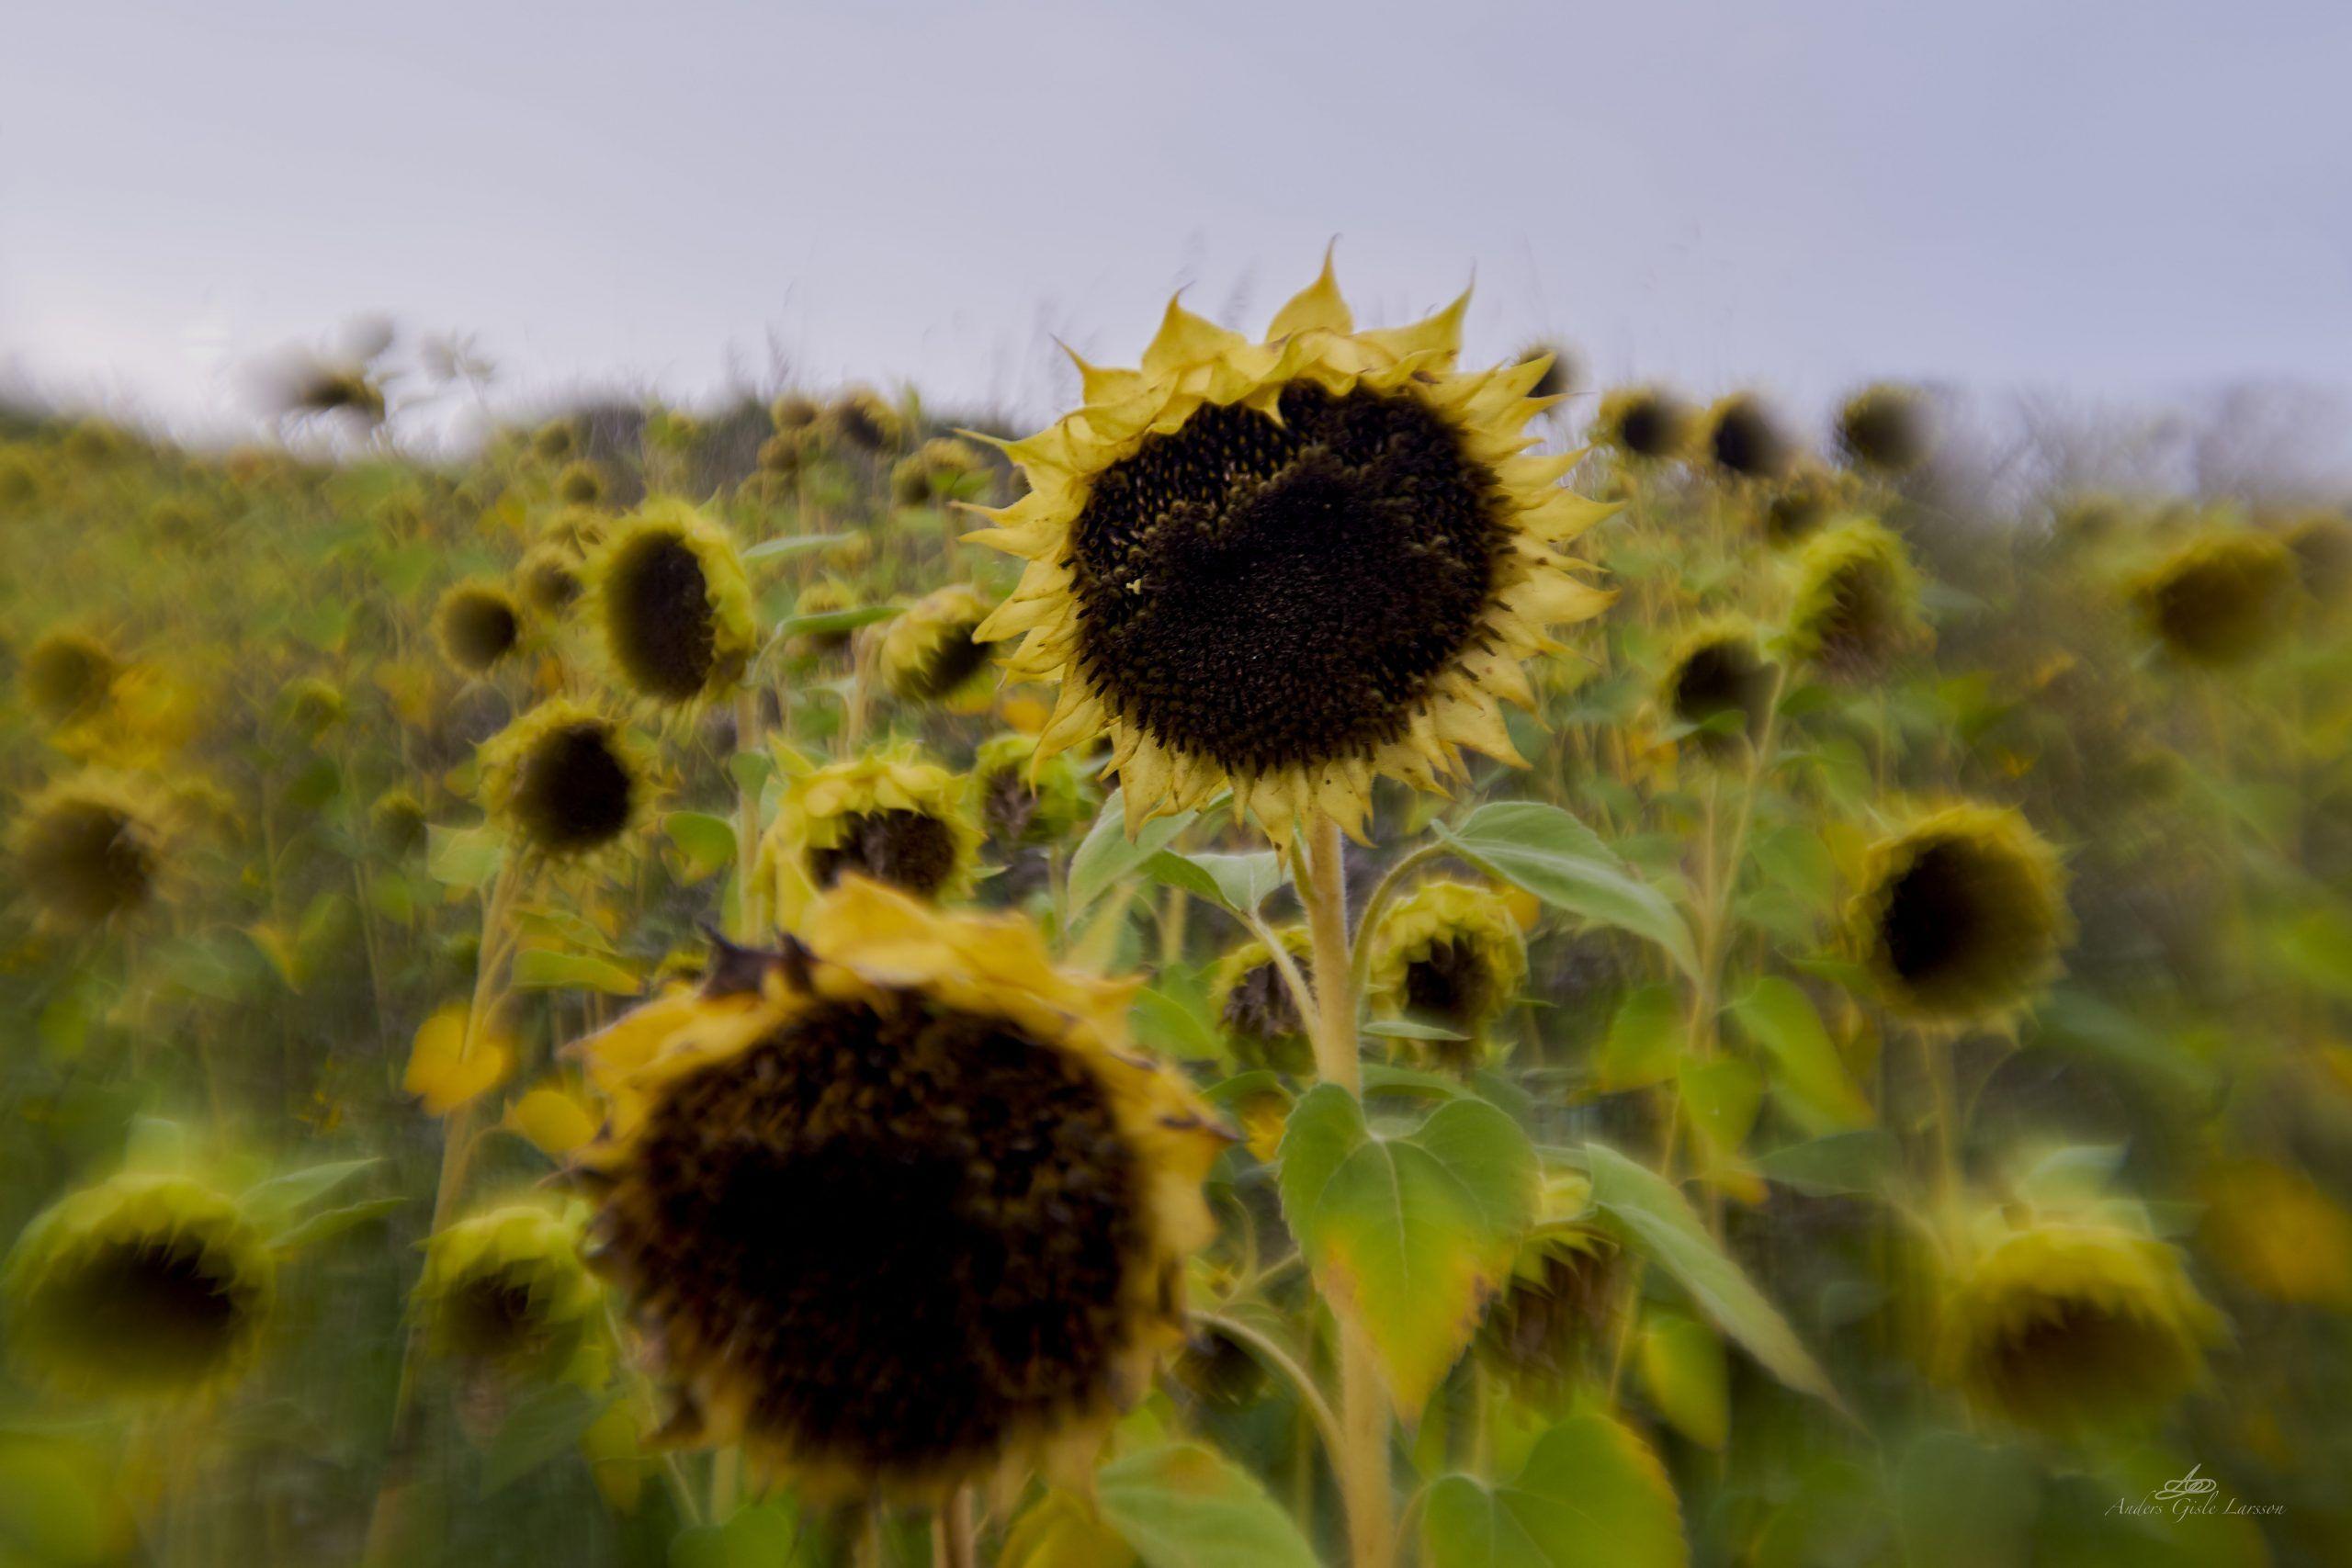 Summer was here, 234/365, Uge 34, Ammelhede, Assentoft, Randers